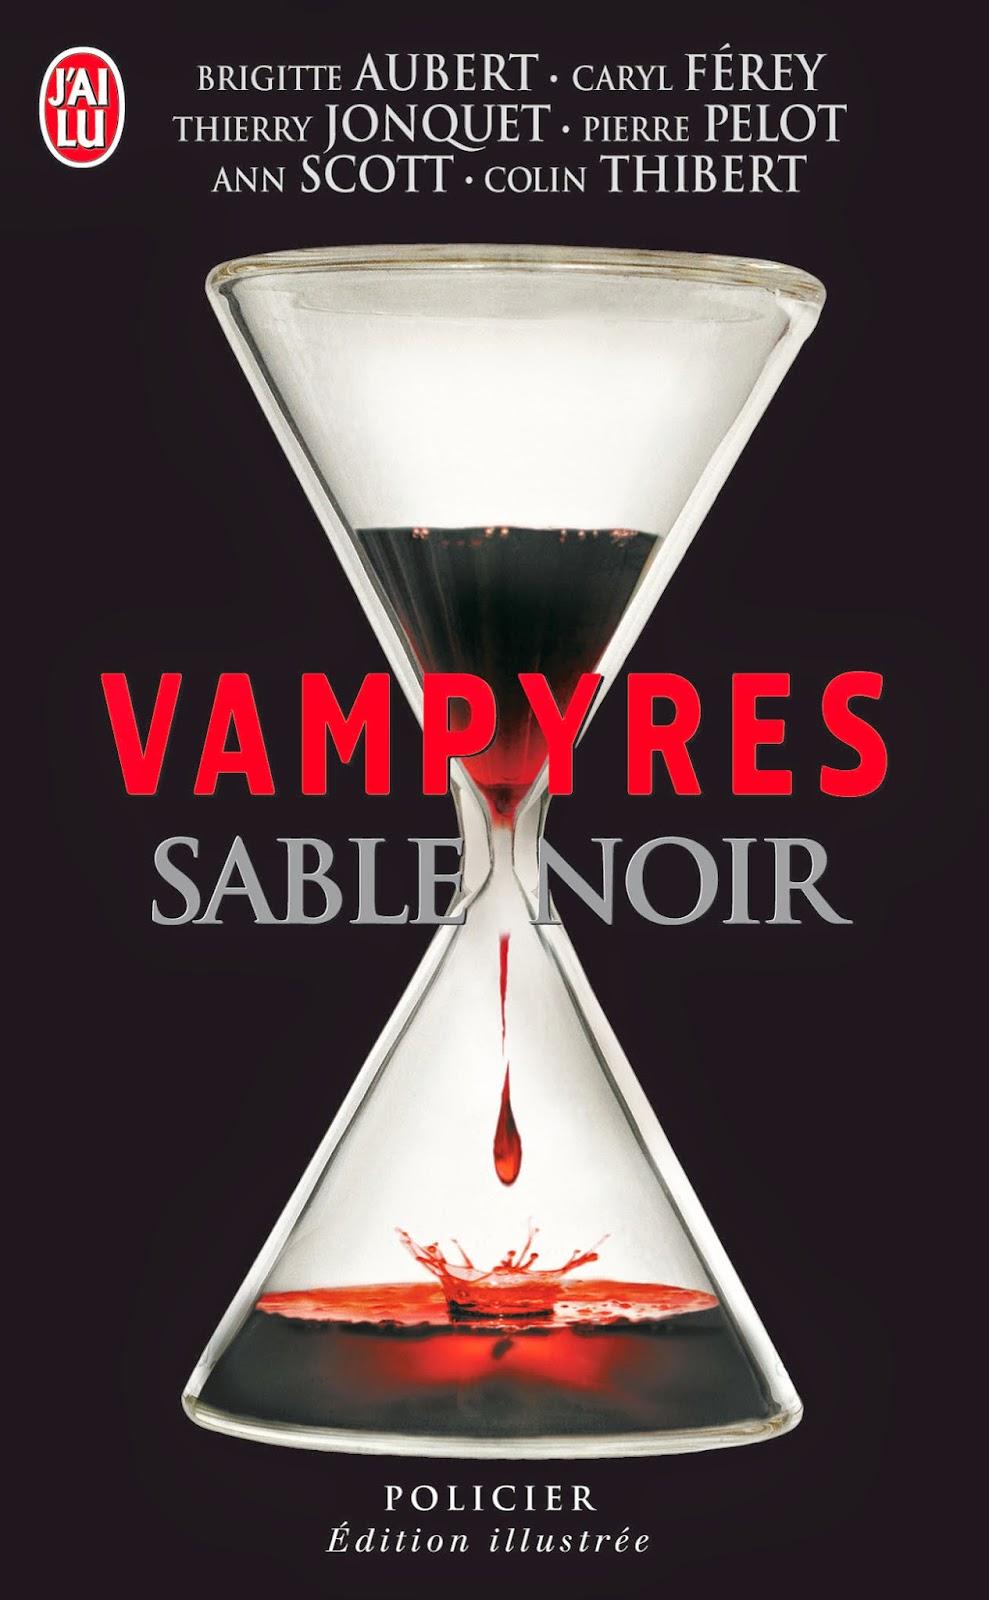 vampyres ferey aubert j'ai lu